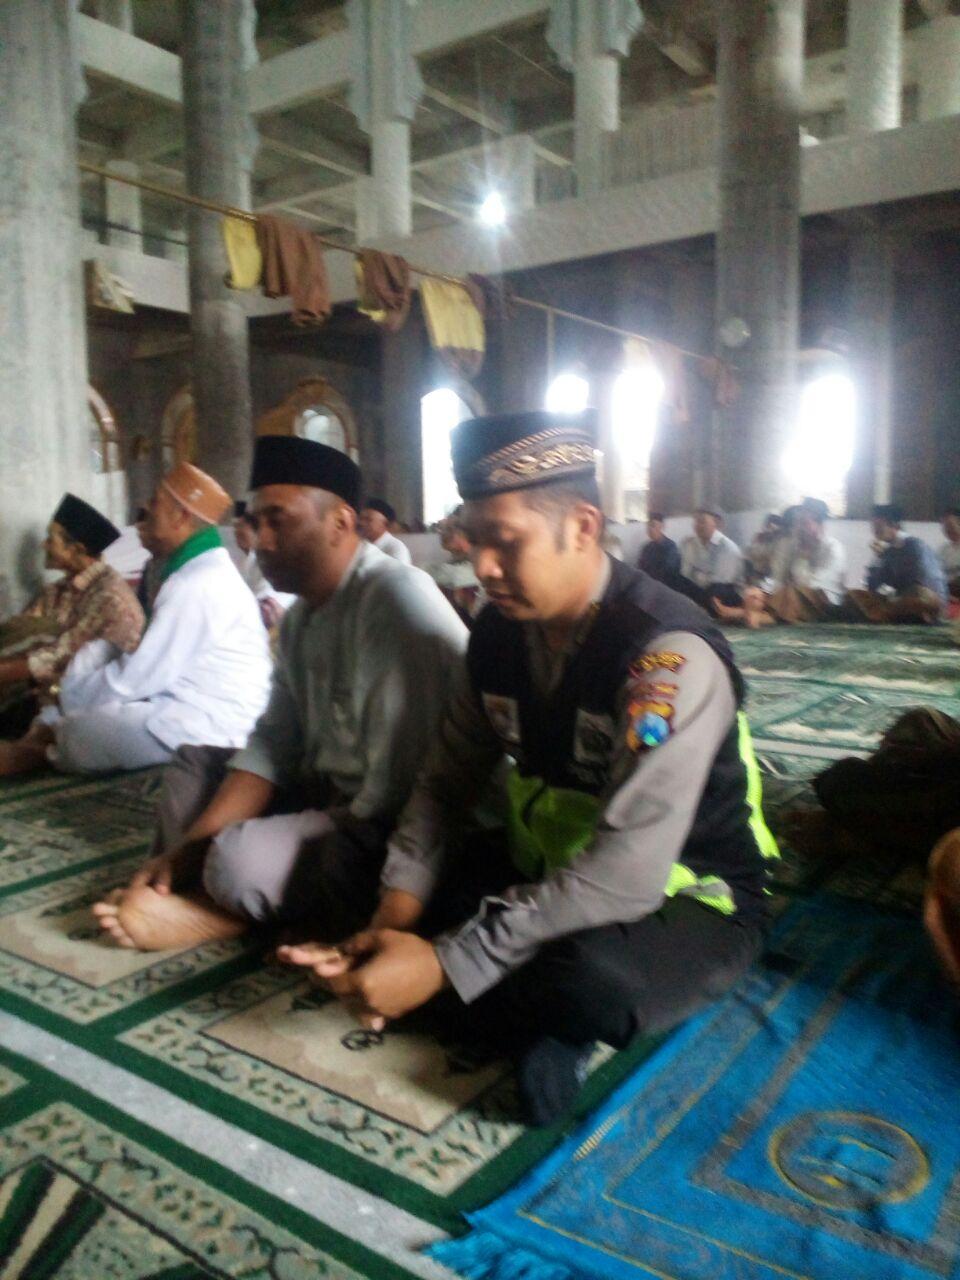 Bhabinkamtibmas Polsek Pujon Polres Batu Menghadiri Pengajian Menyambut Isra' Mi'raj Di Masjid Nurul Huda